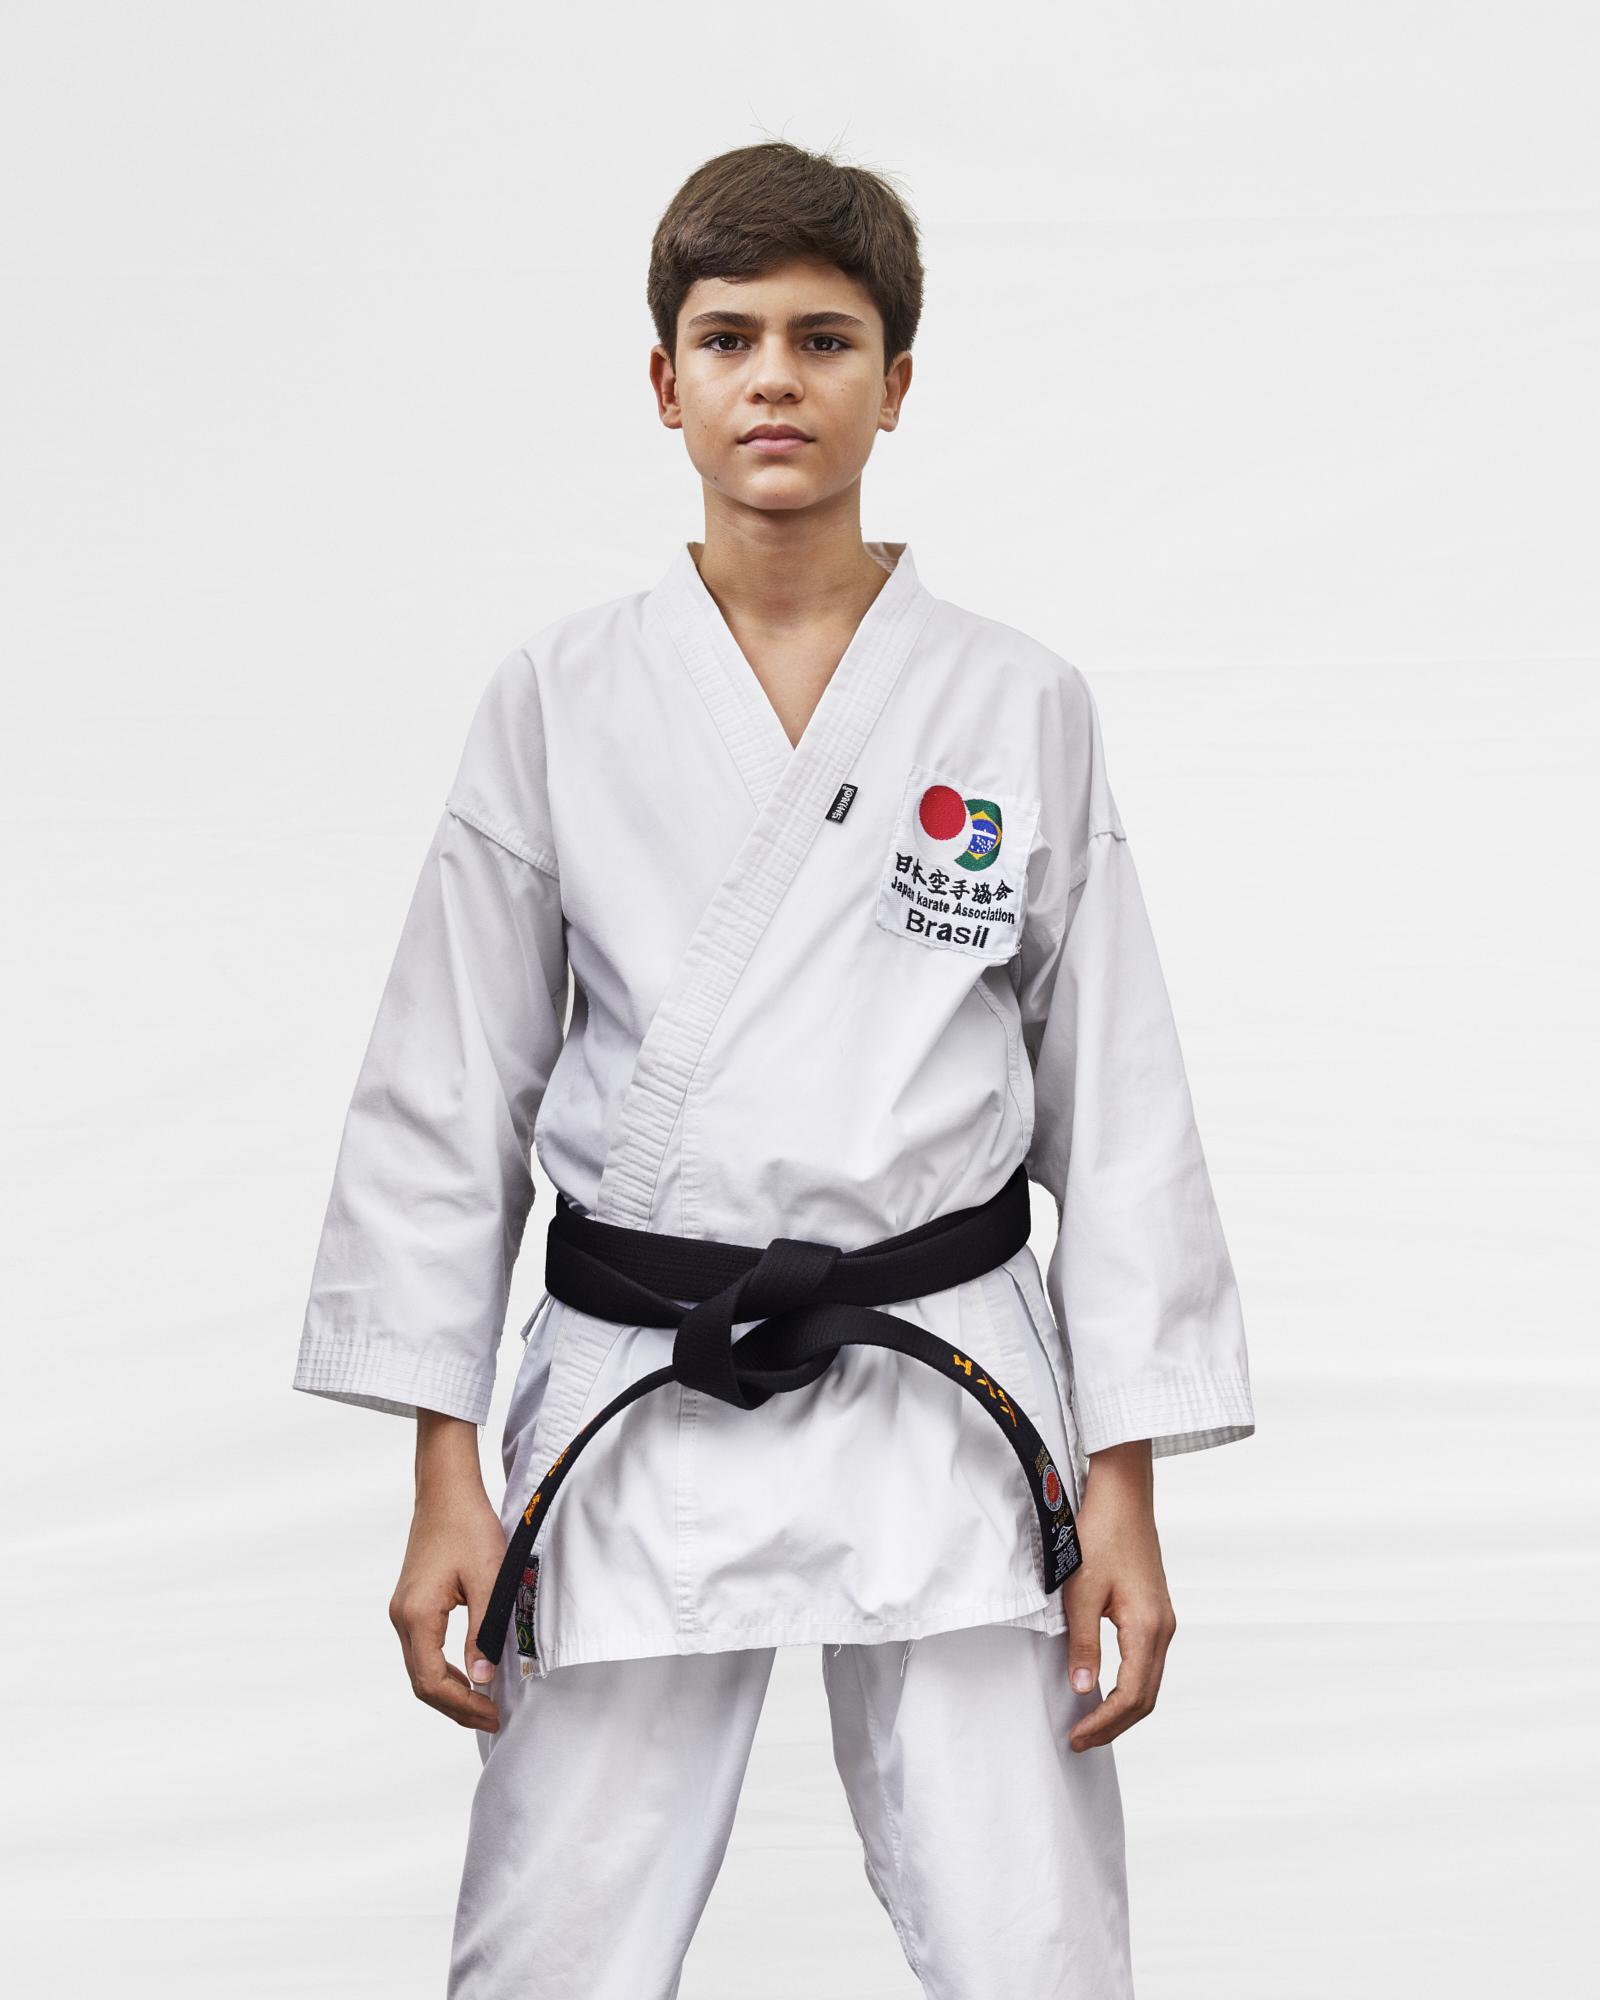 Enzo Sá Pantoja da Silva